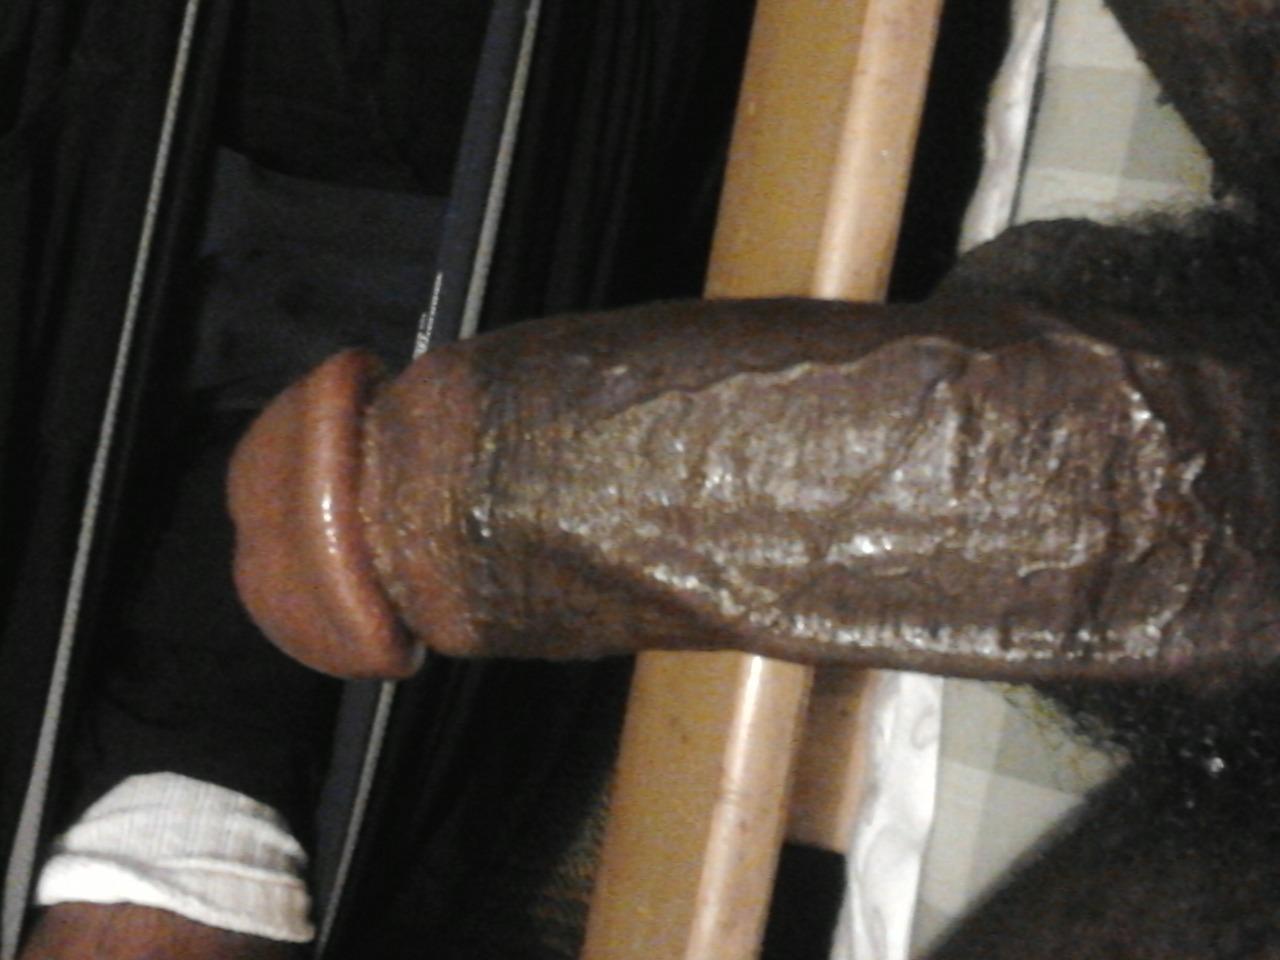 Xnxx busty indian